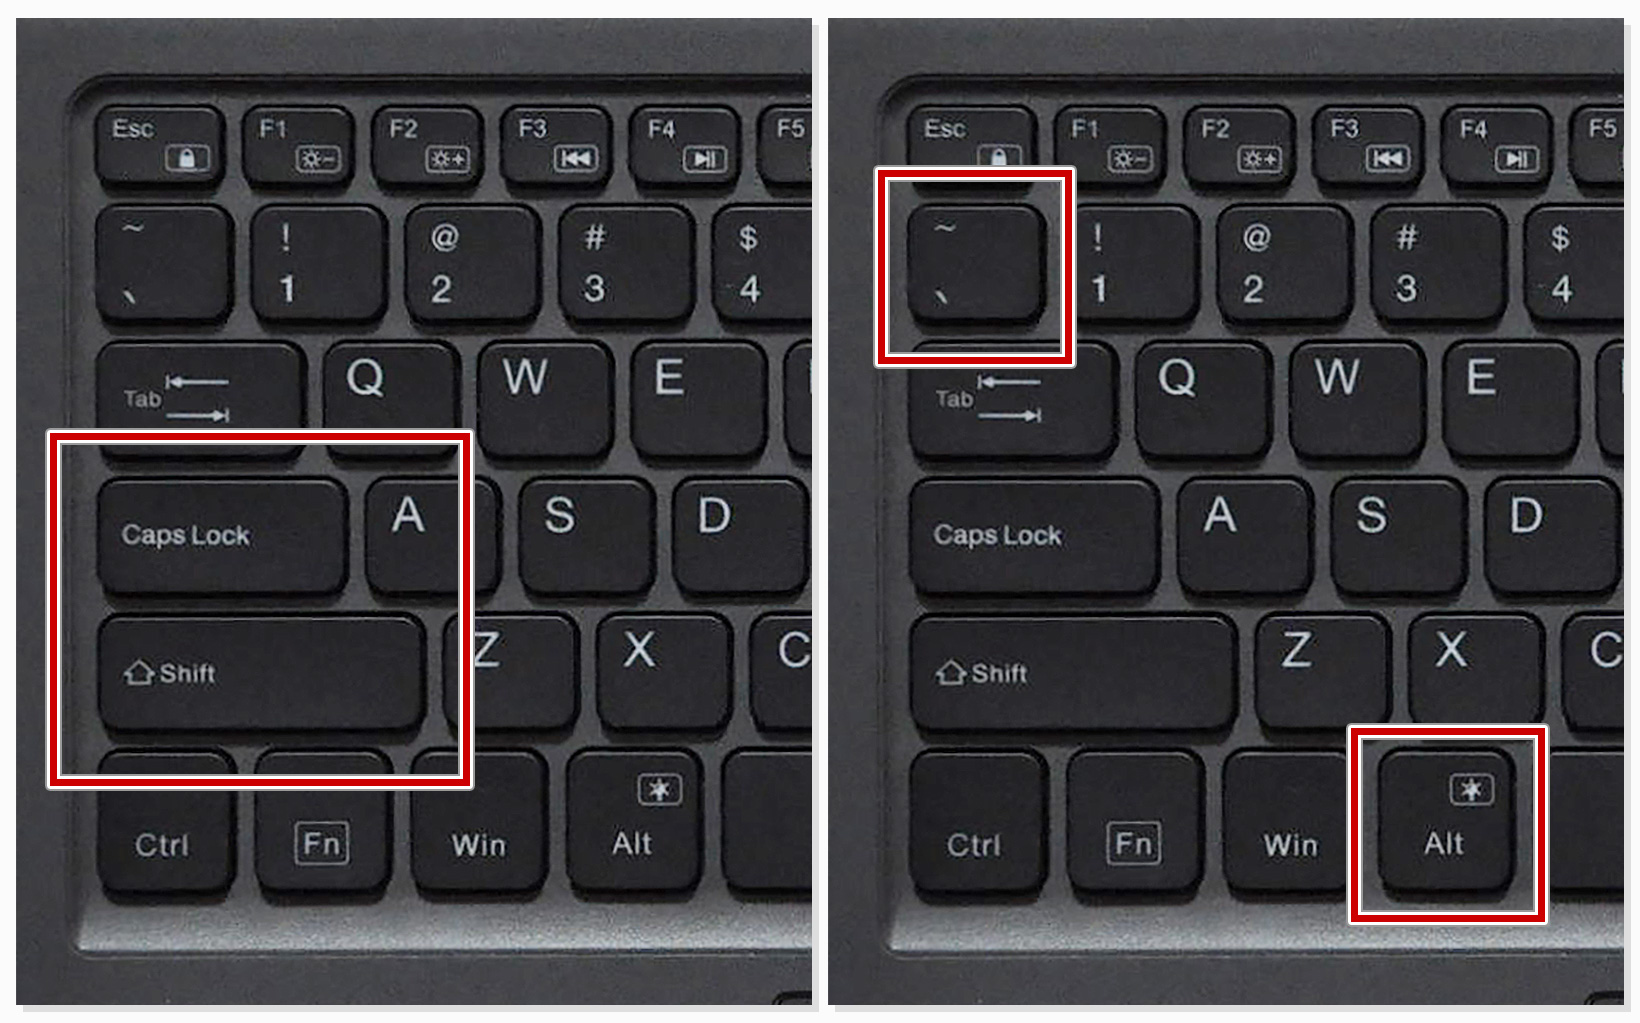 US配列キーボードの半角/全角切り替え